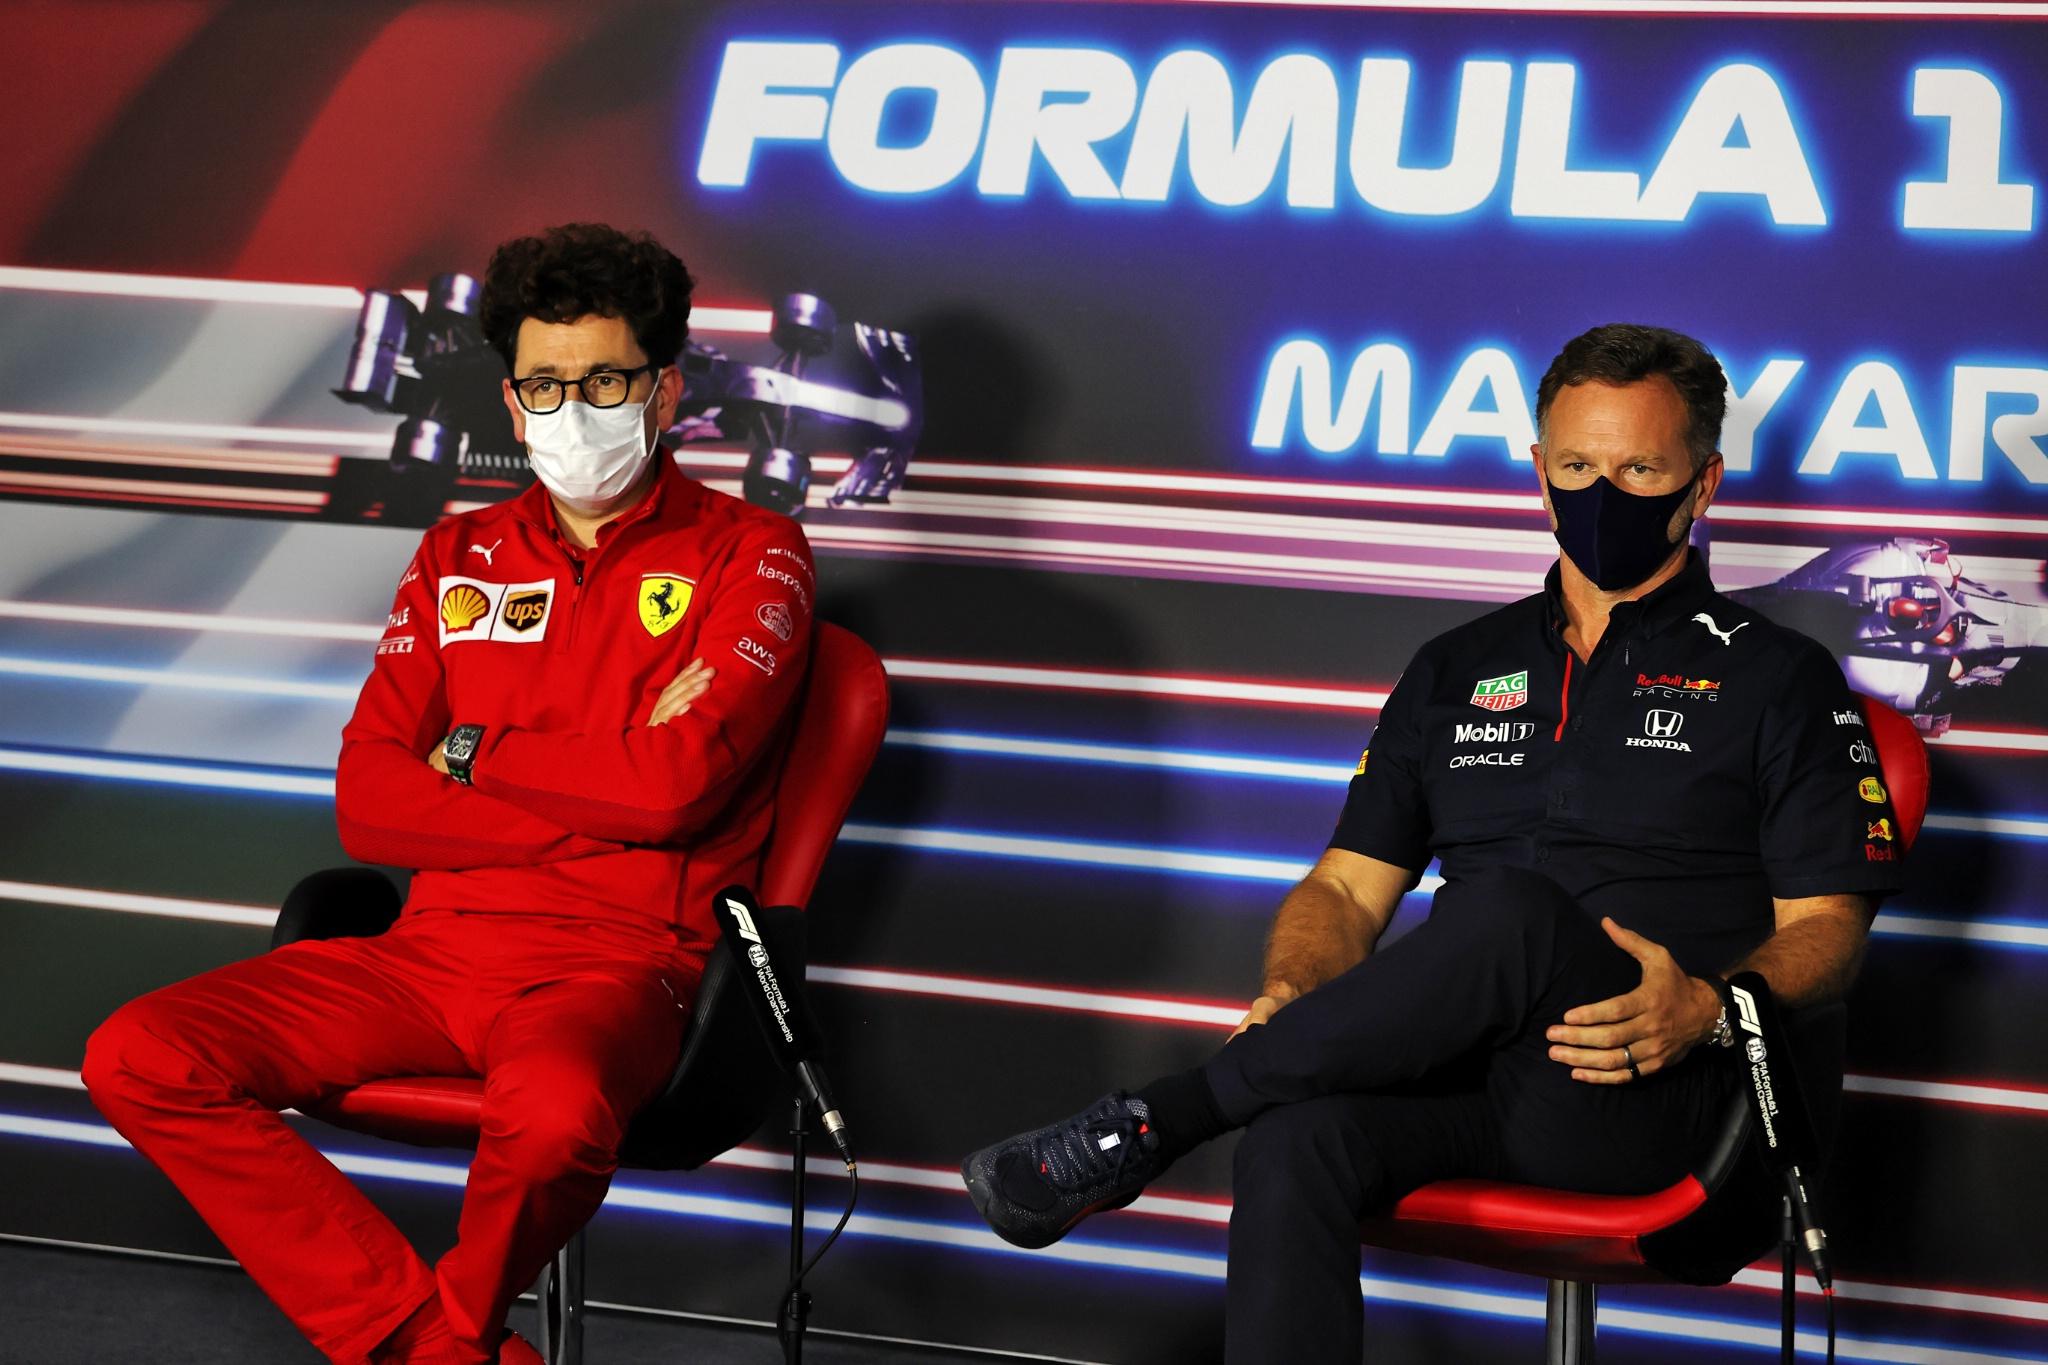 (L to R): Mattia Binotto (ITA) Ferrari Team Principal and Christian Horner (GBR) Red Bull Racing Team Principal in the FIA Press Conference.